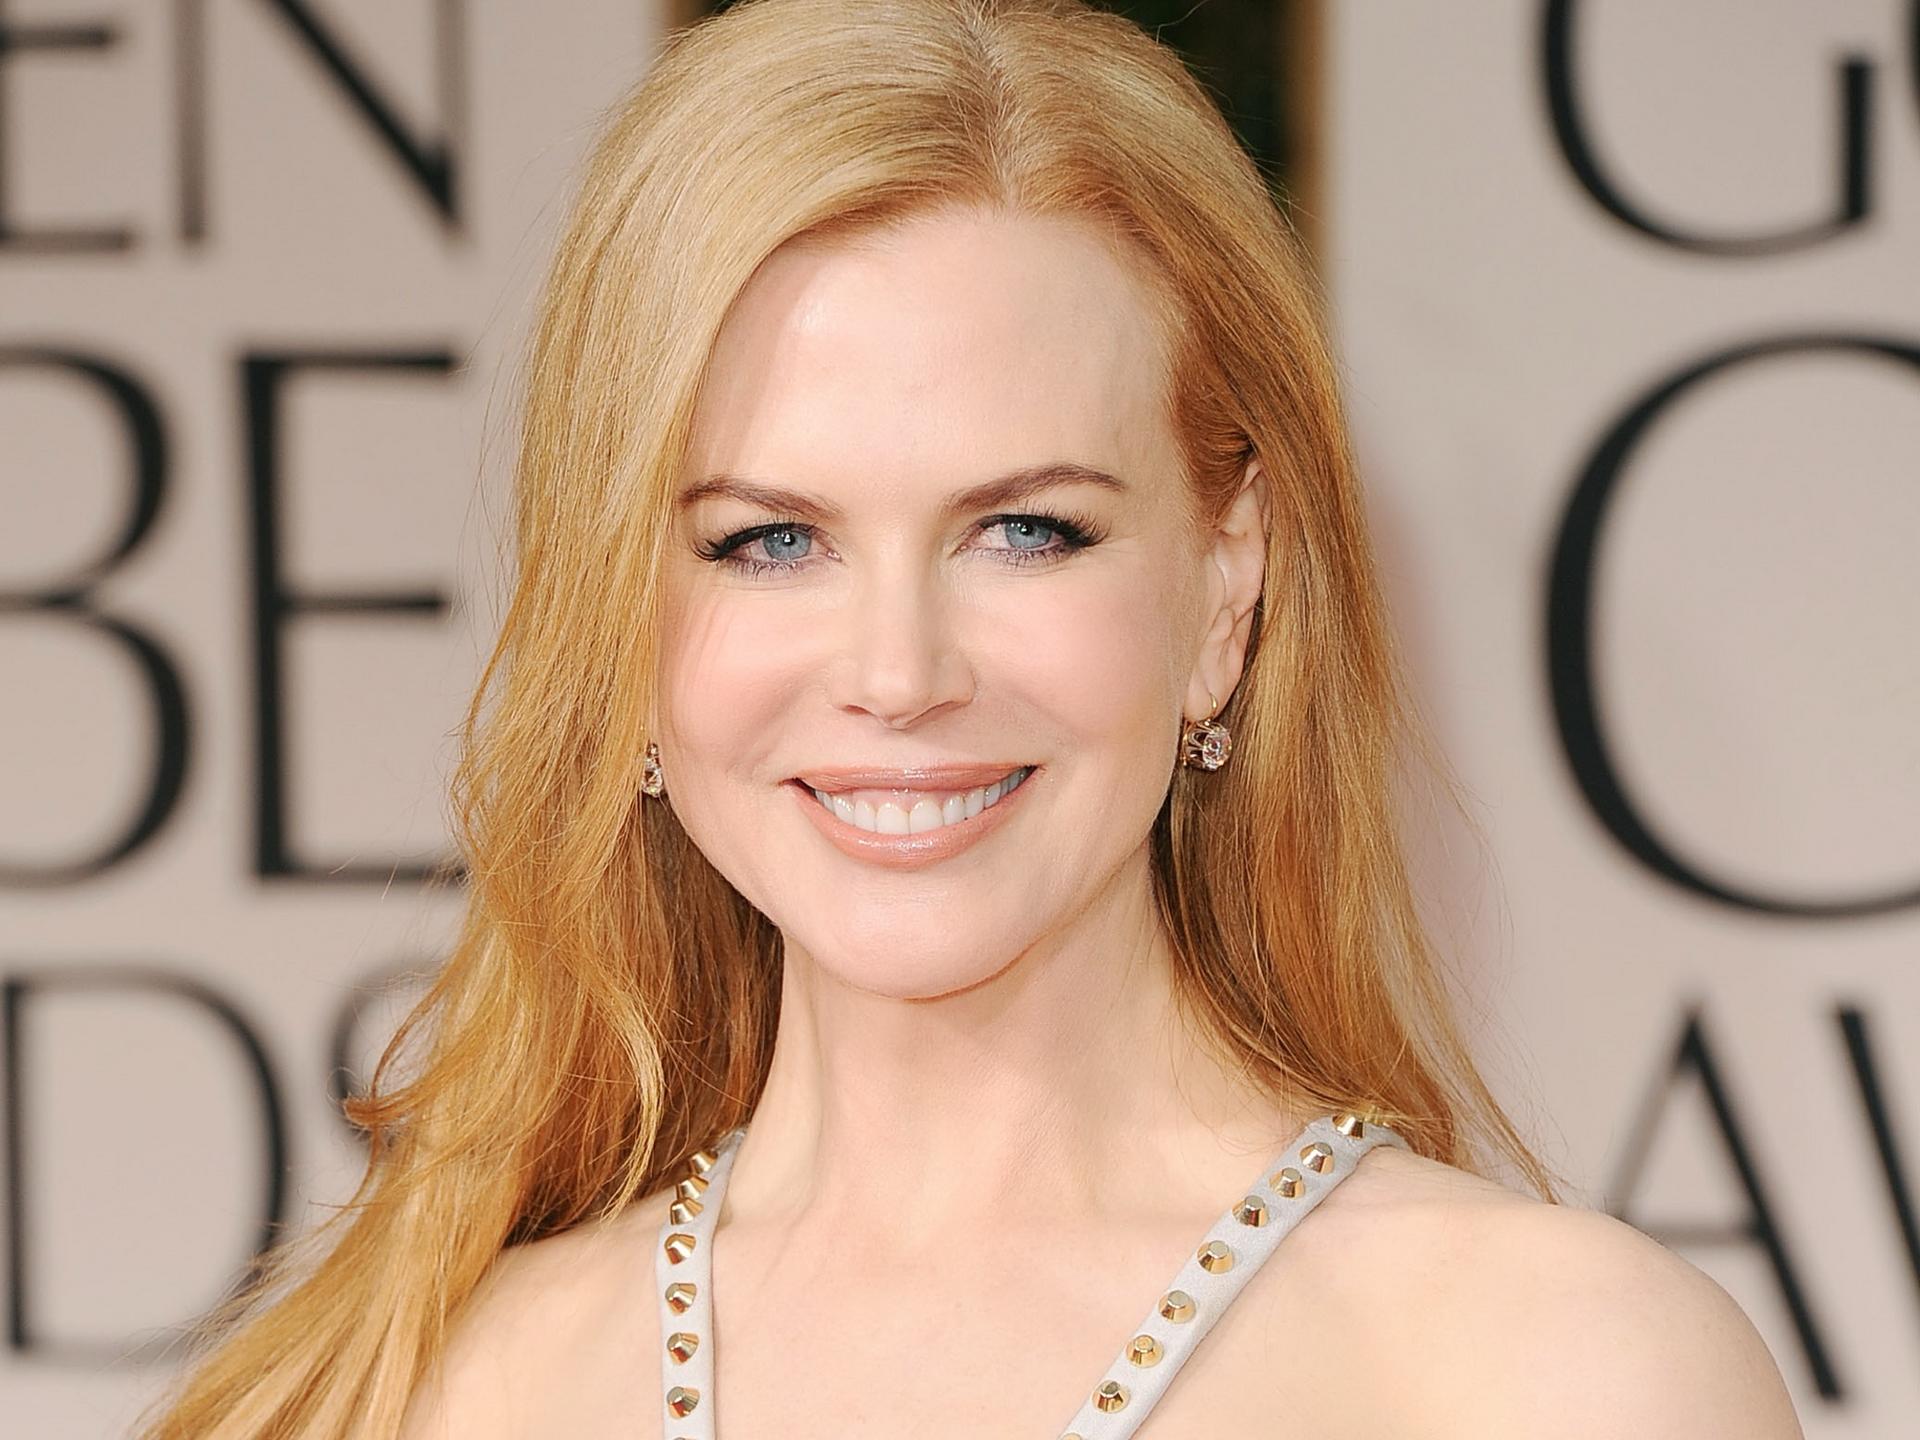 Nicole Kidman - 1920x1440